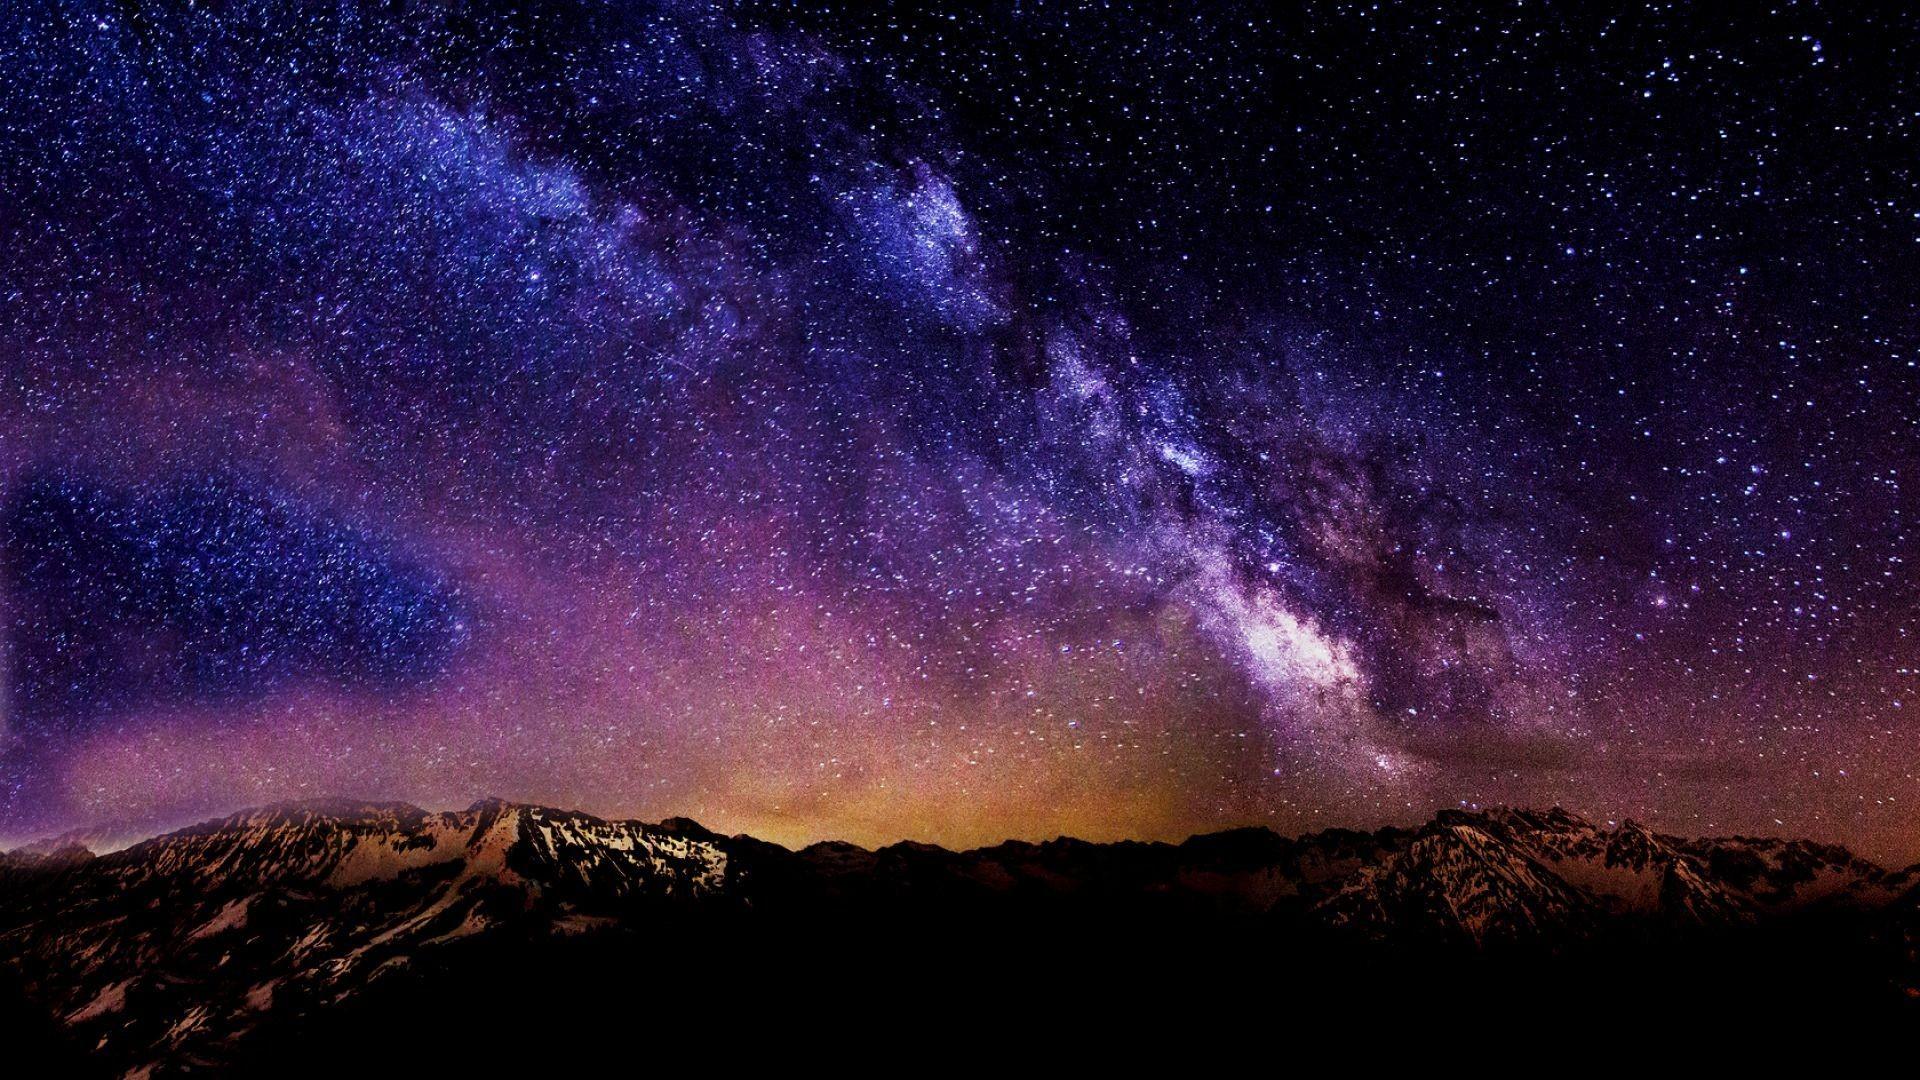 Starry Night Desktop Wallpaper, Starry Night Backgrounds, New .